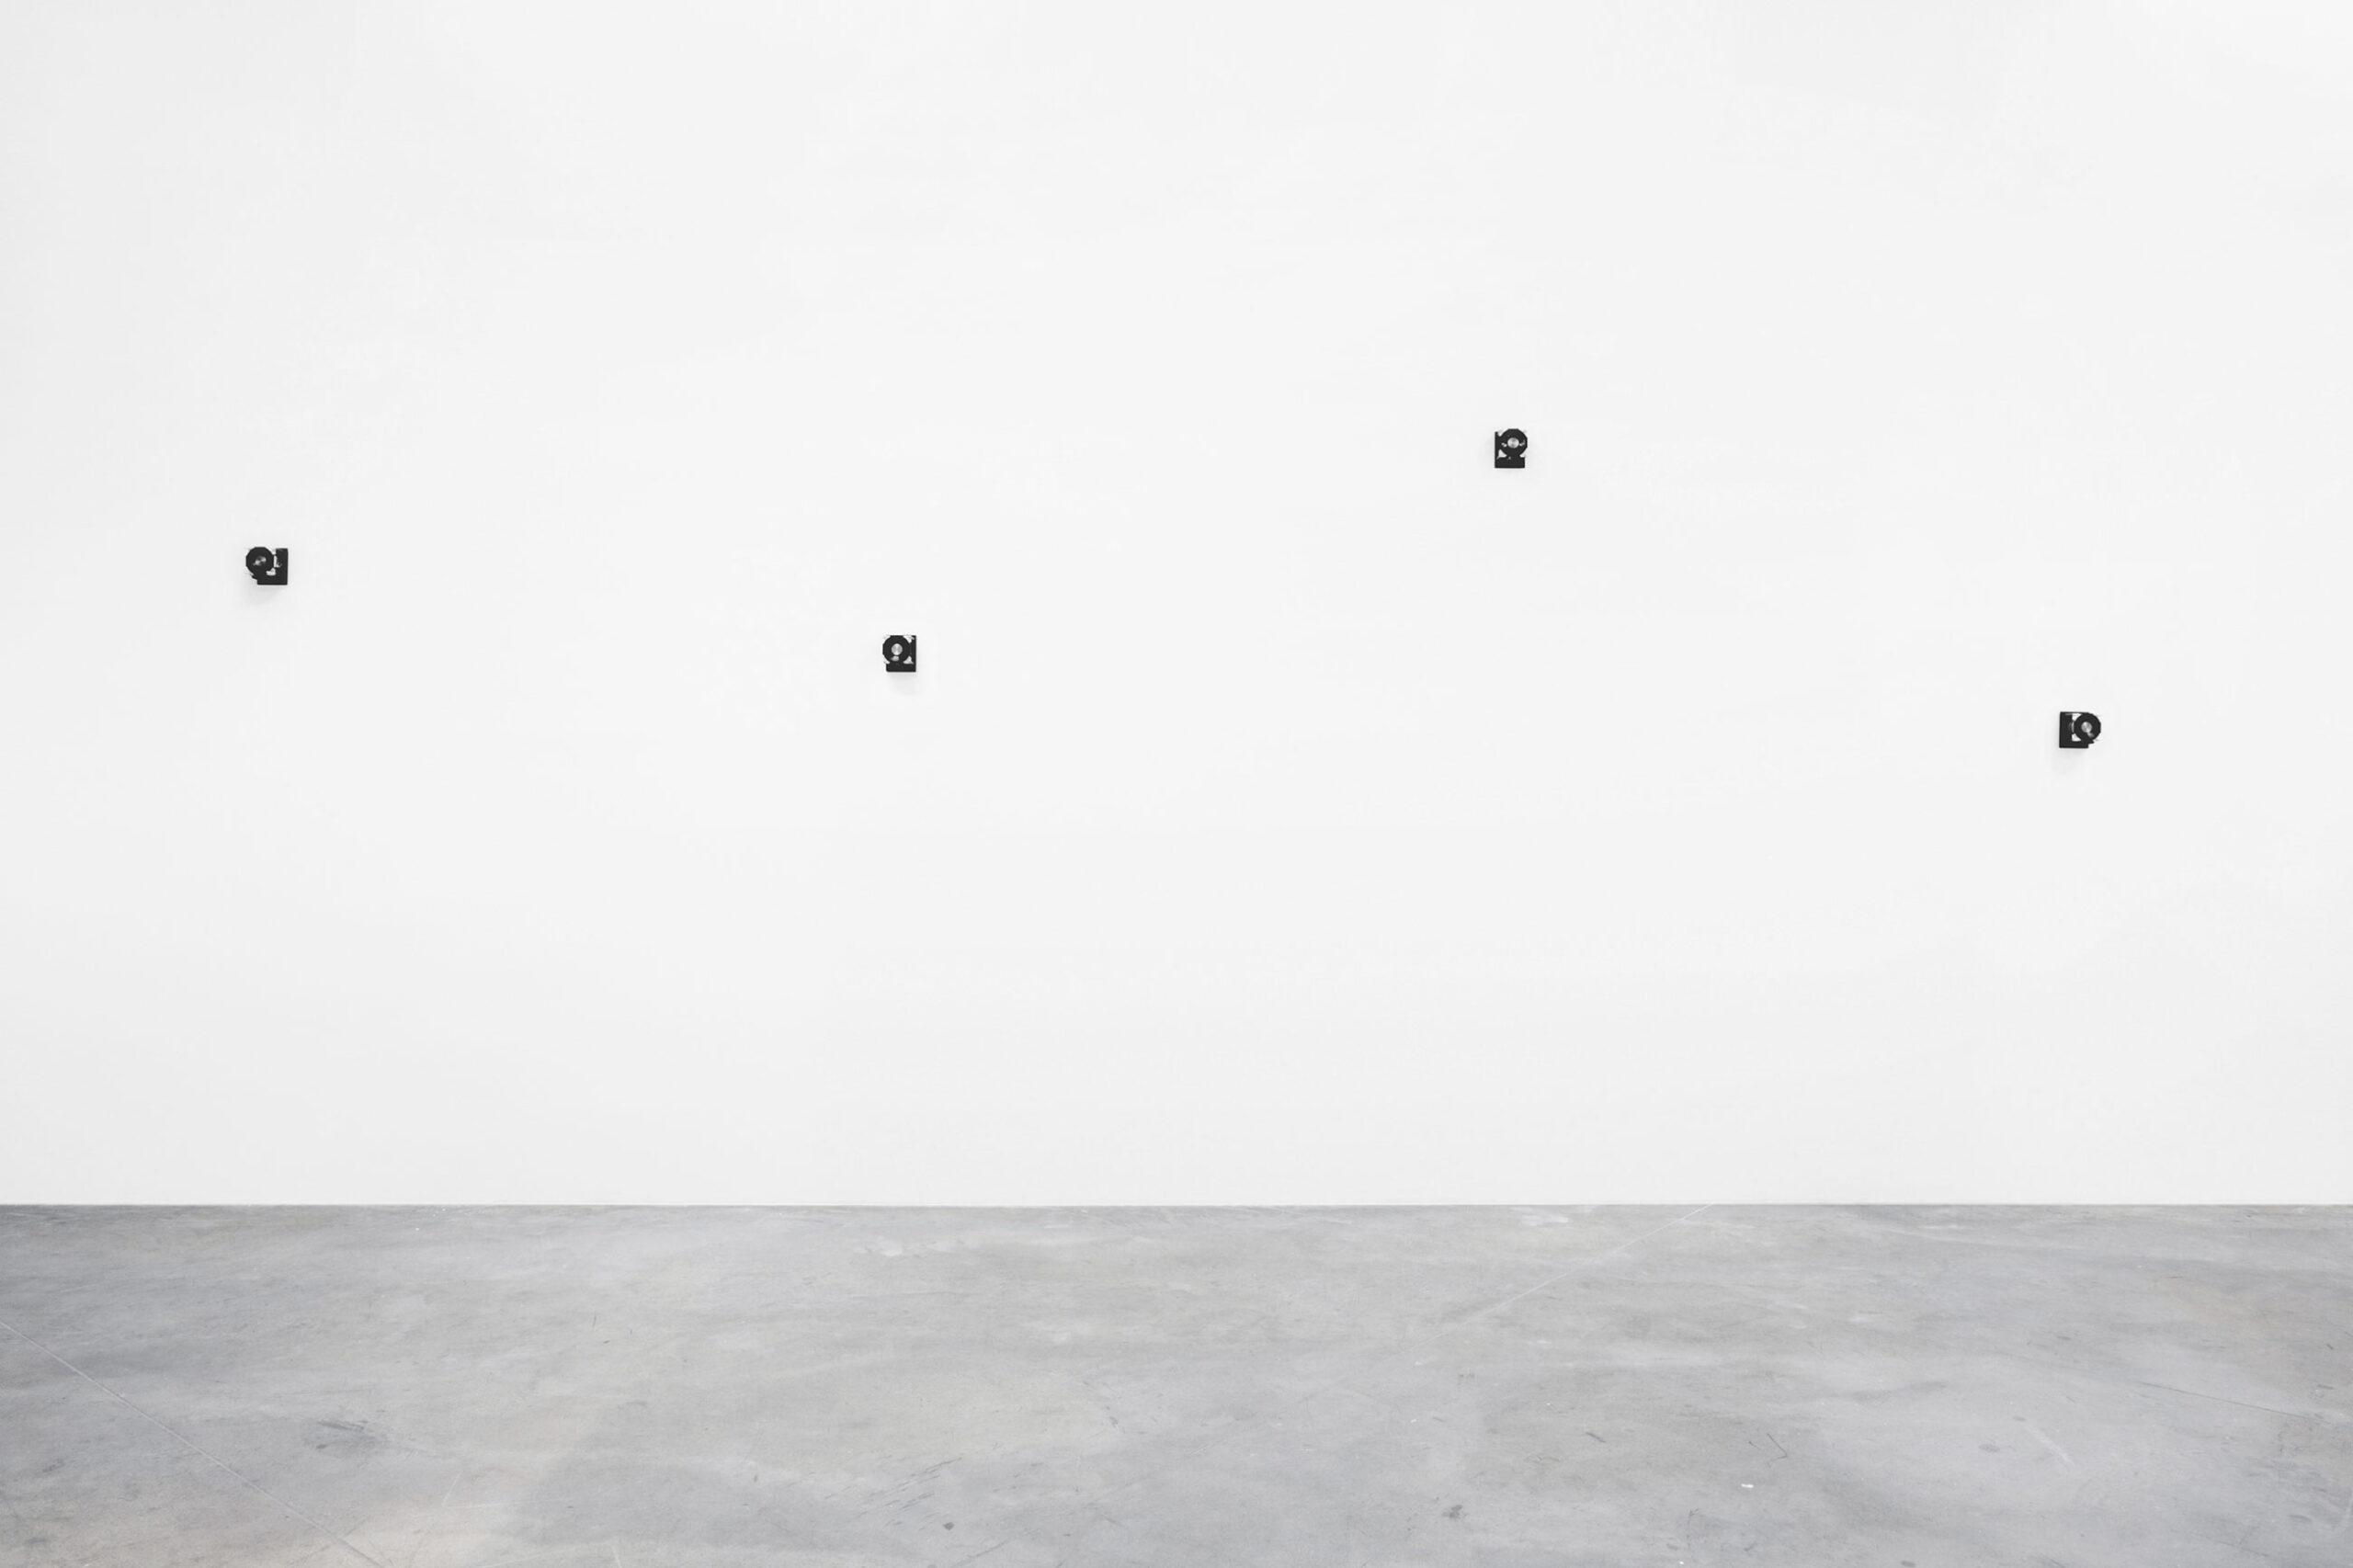 Jacek Doroszenko - Silent Souvenirs, exhibition view 2, Fait Gallery, Brno